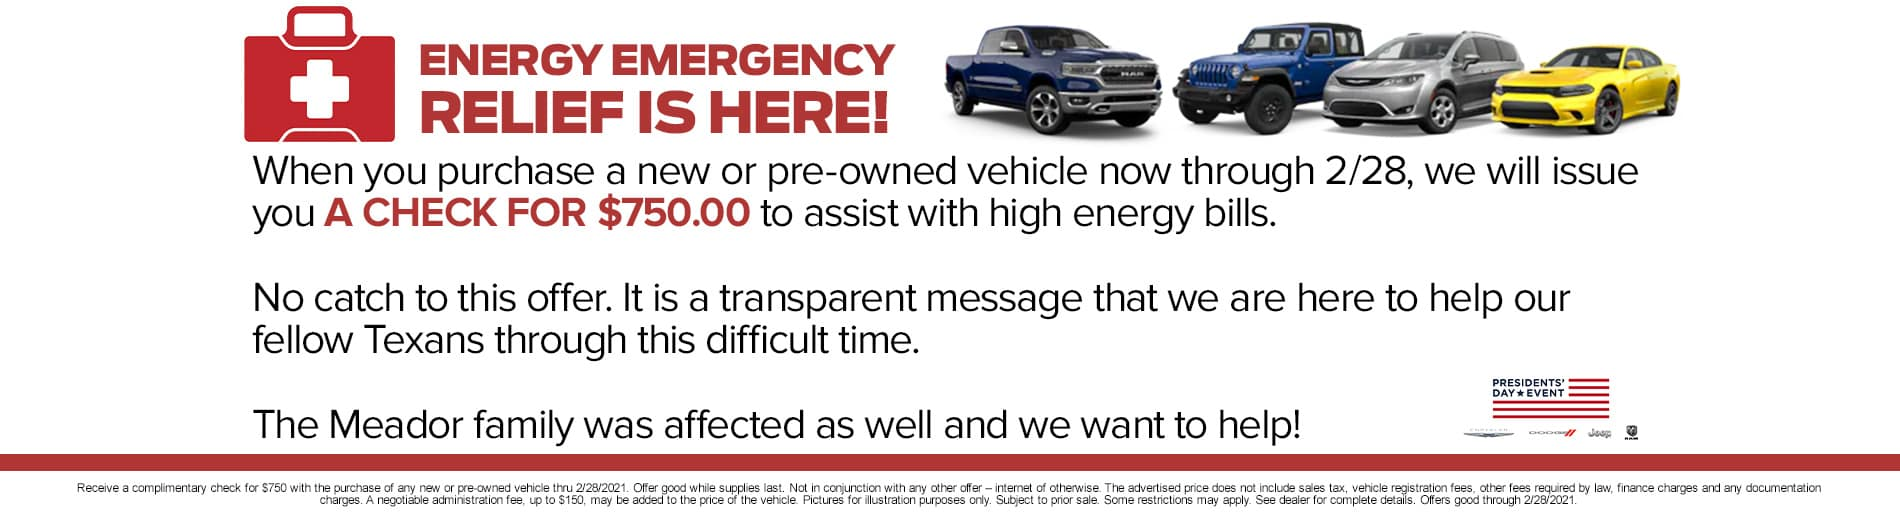 CMED84327-01-FEB21-Emergency-Engery-Relief-1900×514